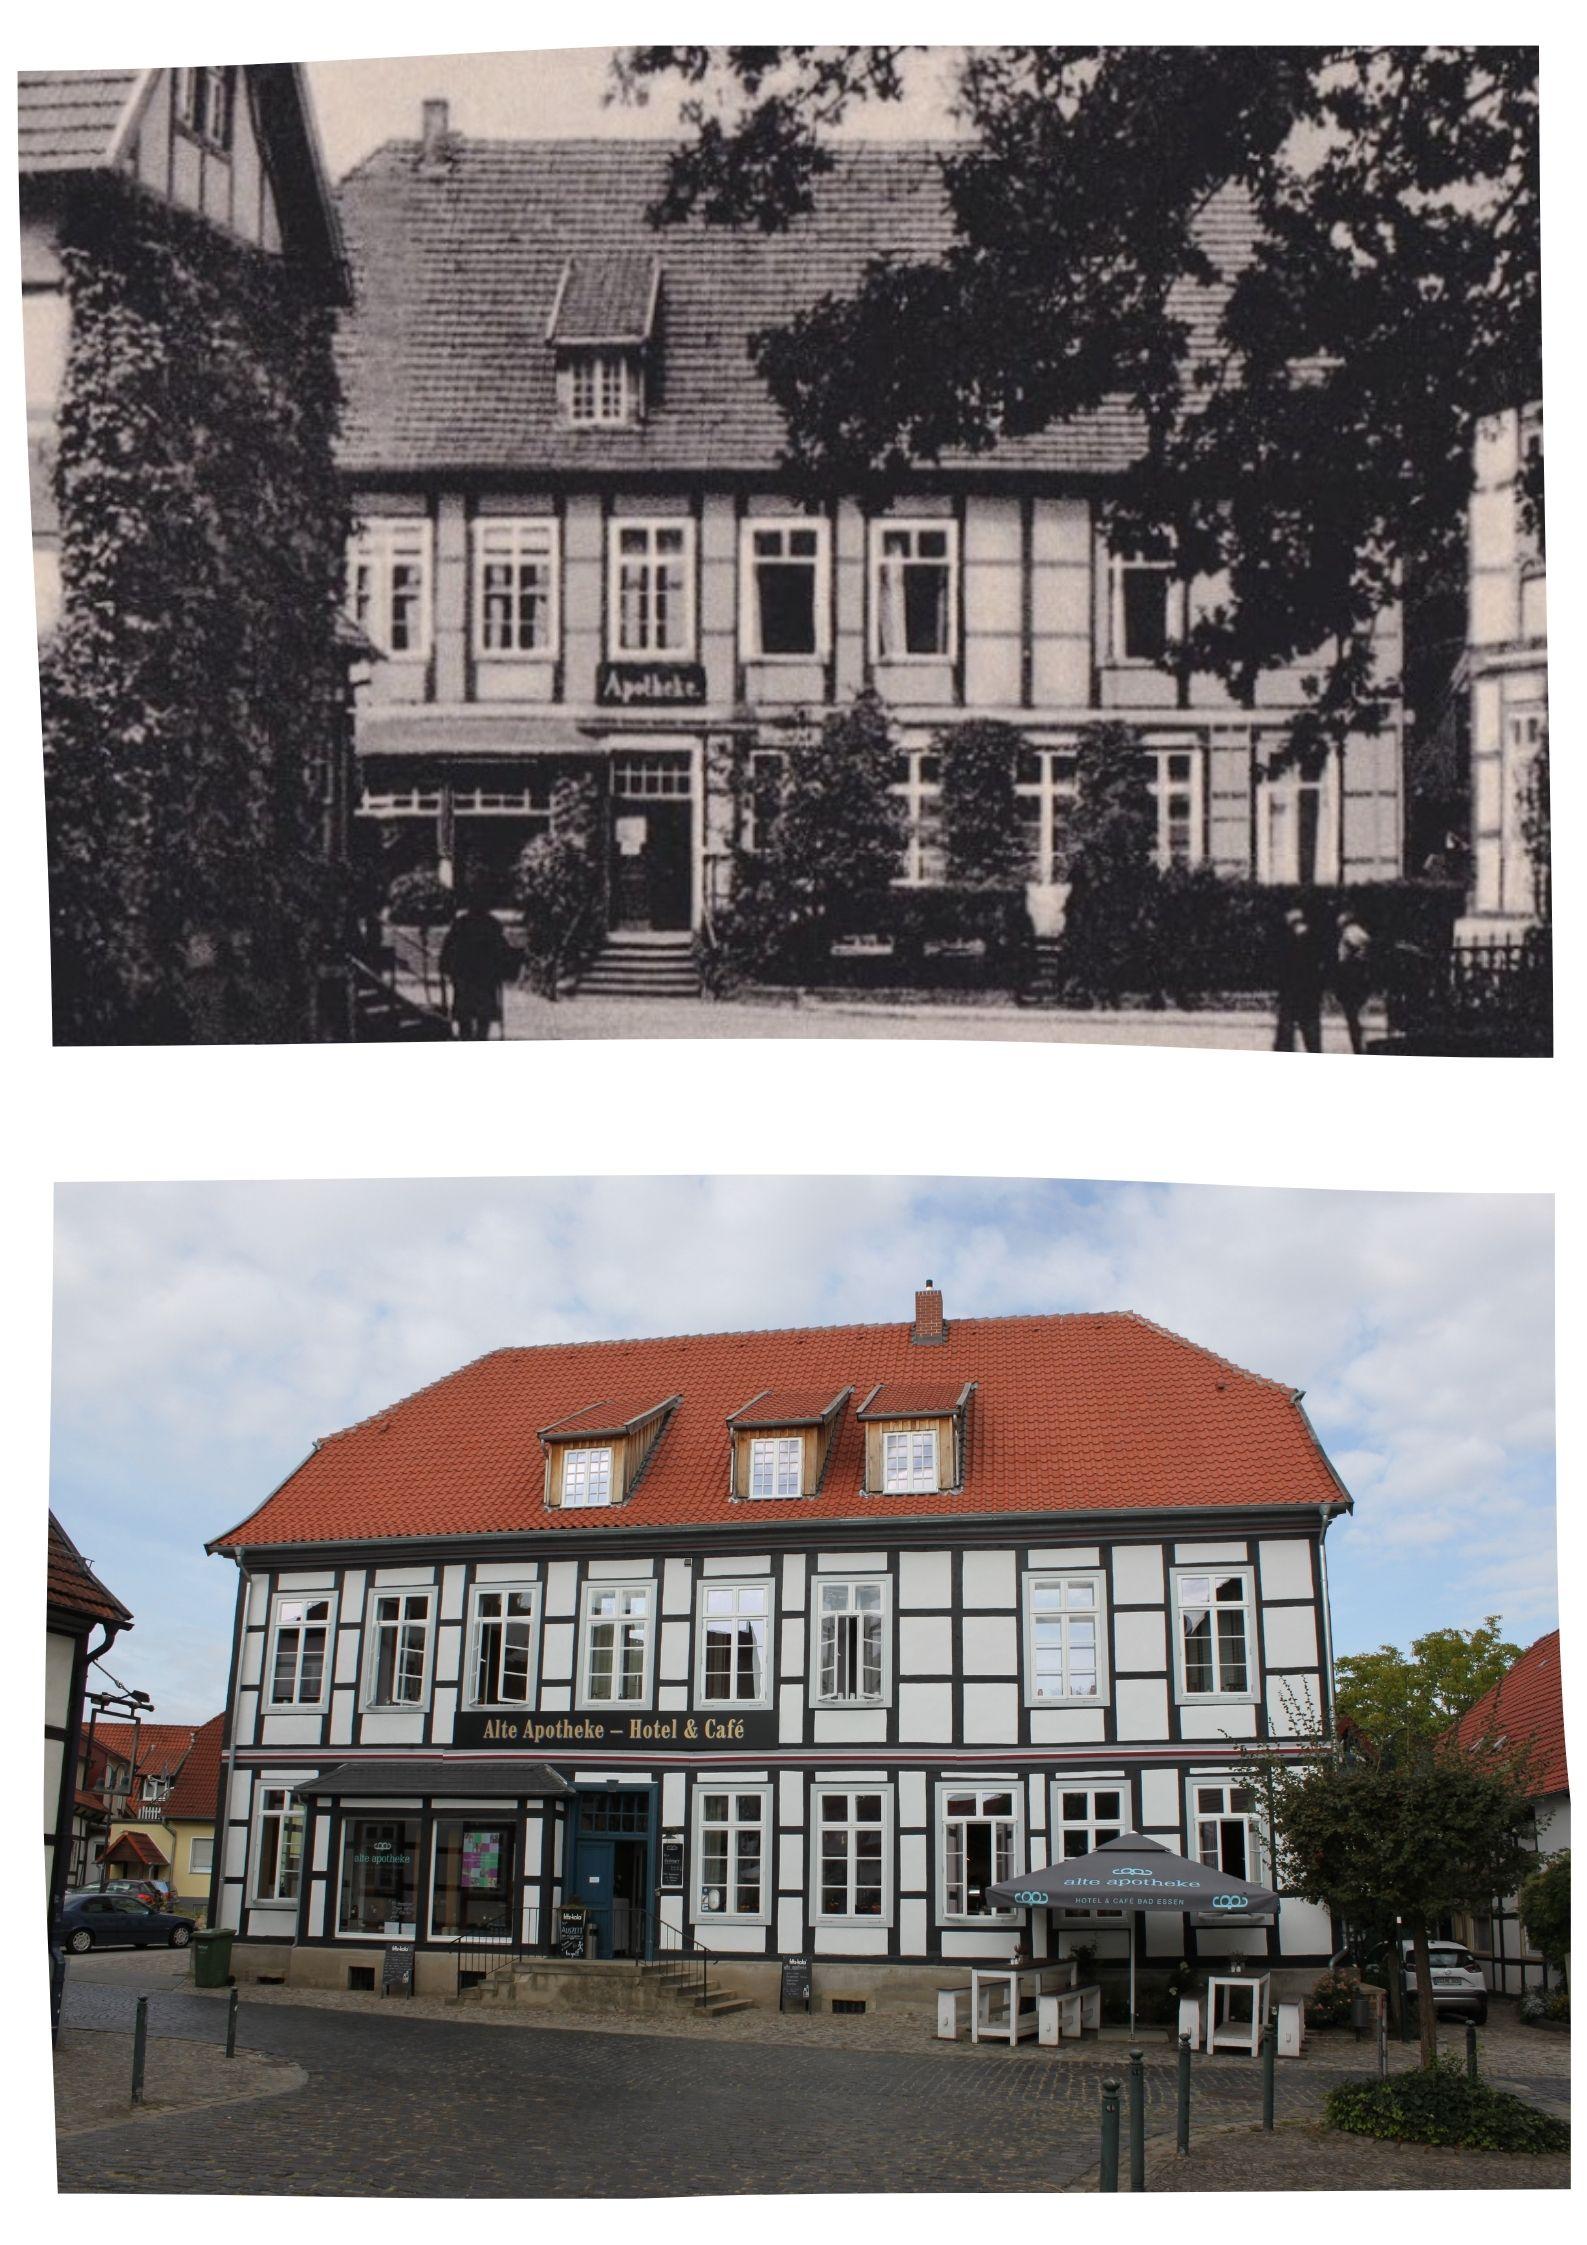 Collage Alte Apotheke Bad Essen